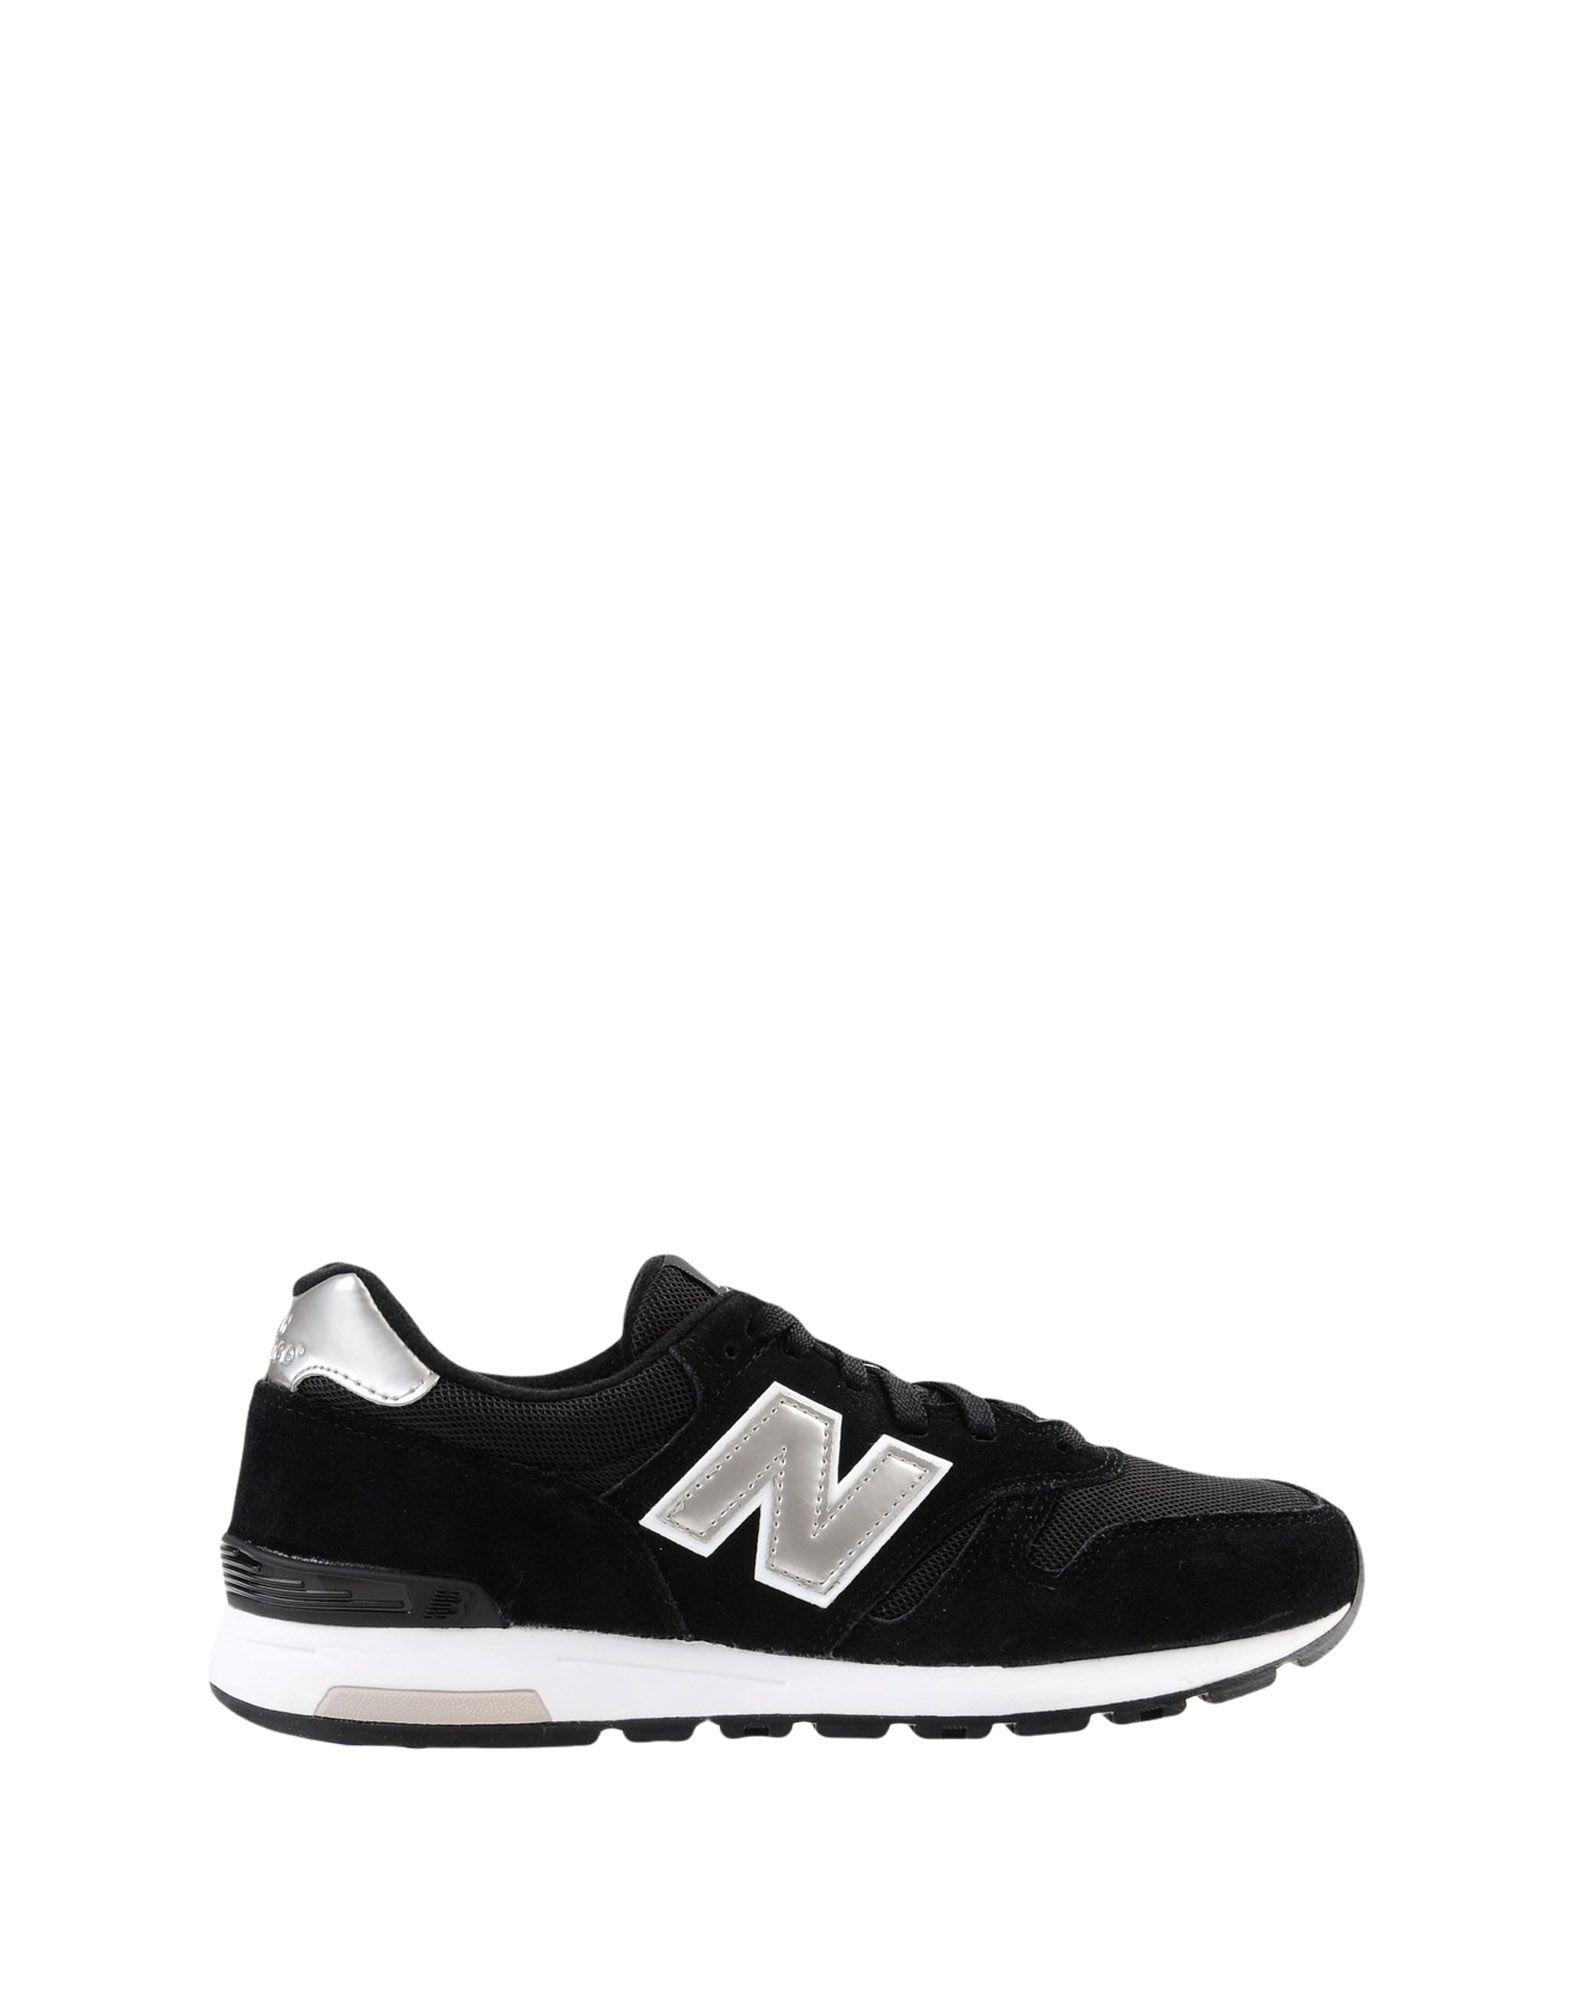 New Balance 565 Suede/Mesh  11466985WU Gute Qualität beliebte Schuhe